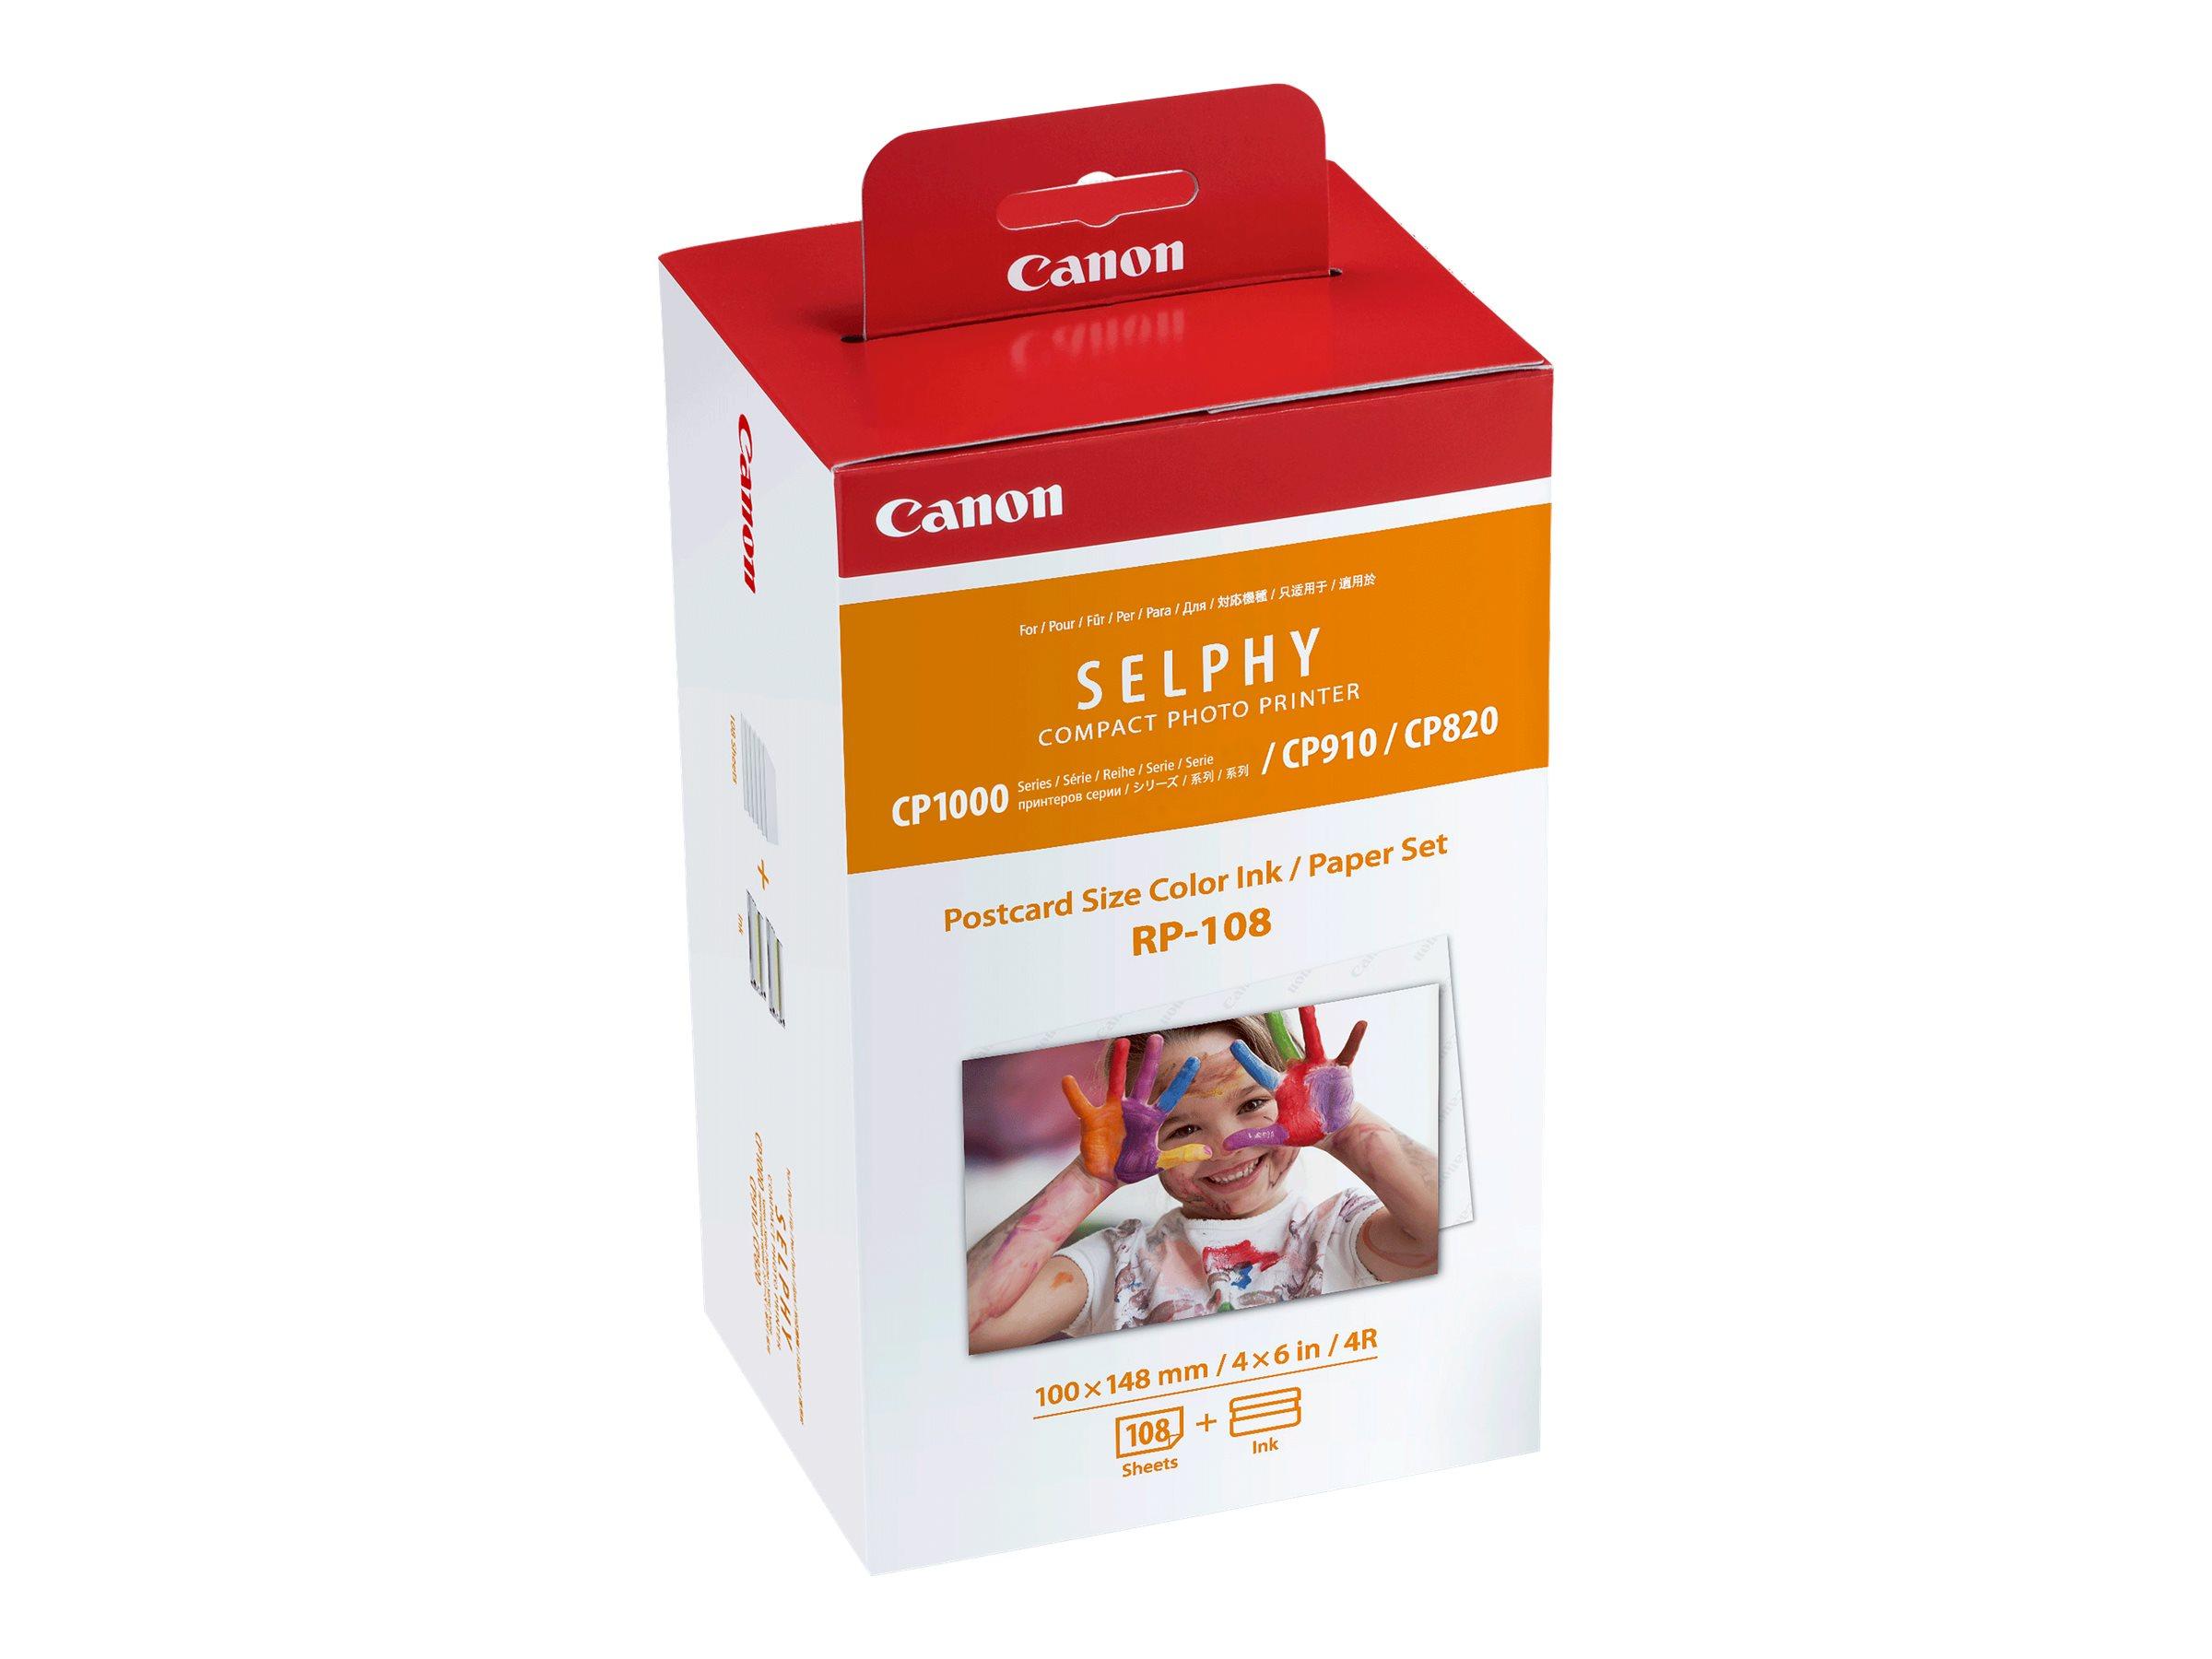 Canon RP-108 - Farbbandkassetten- und Papier-Kit